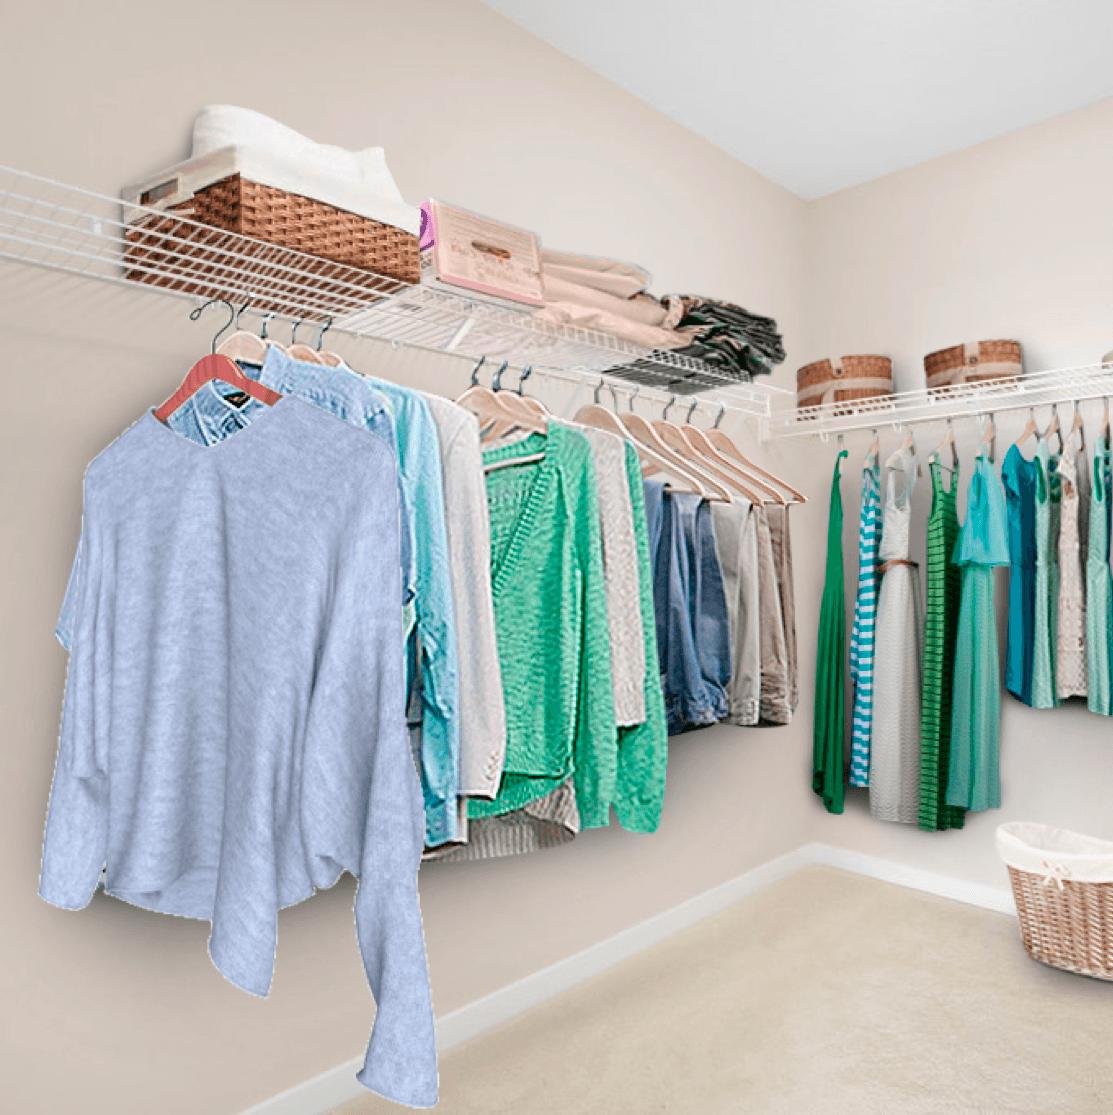 Maximizing Space: The Closet Clothes Image